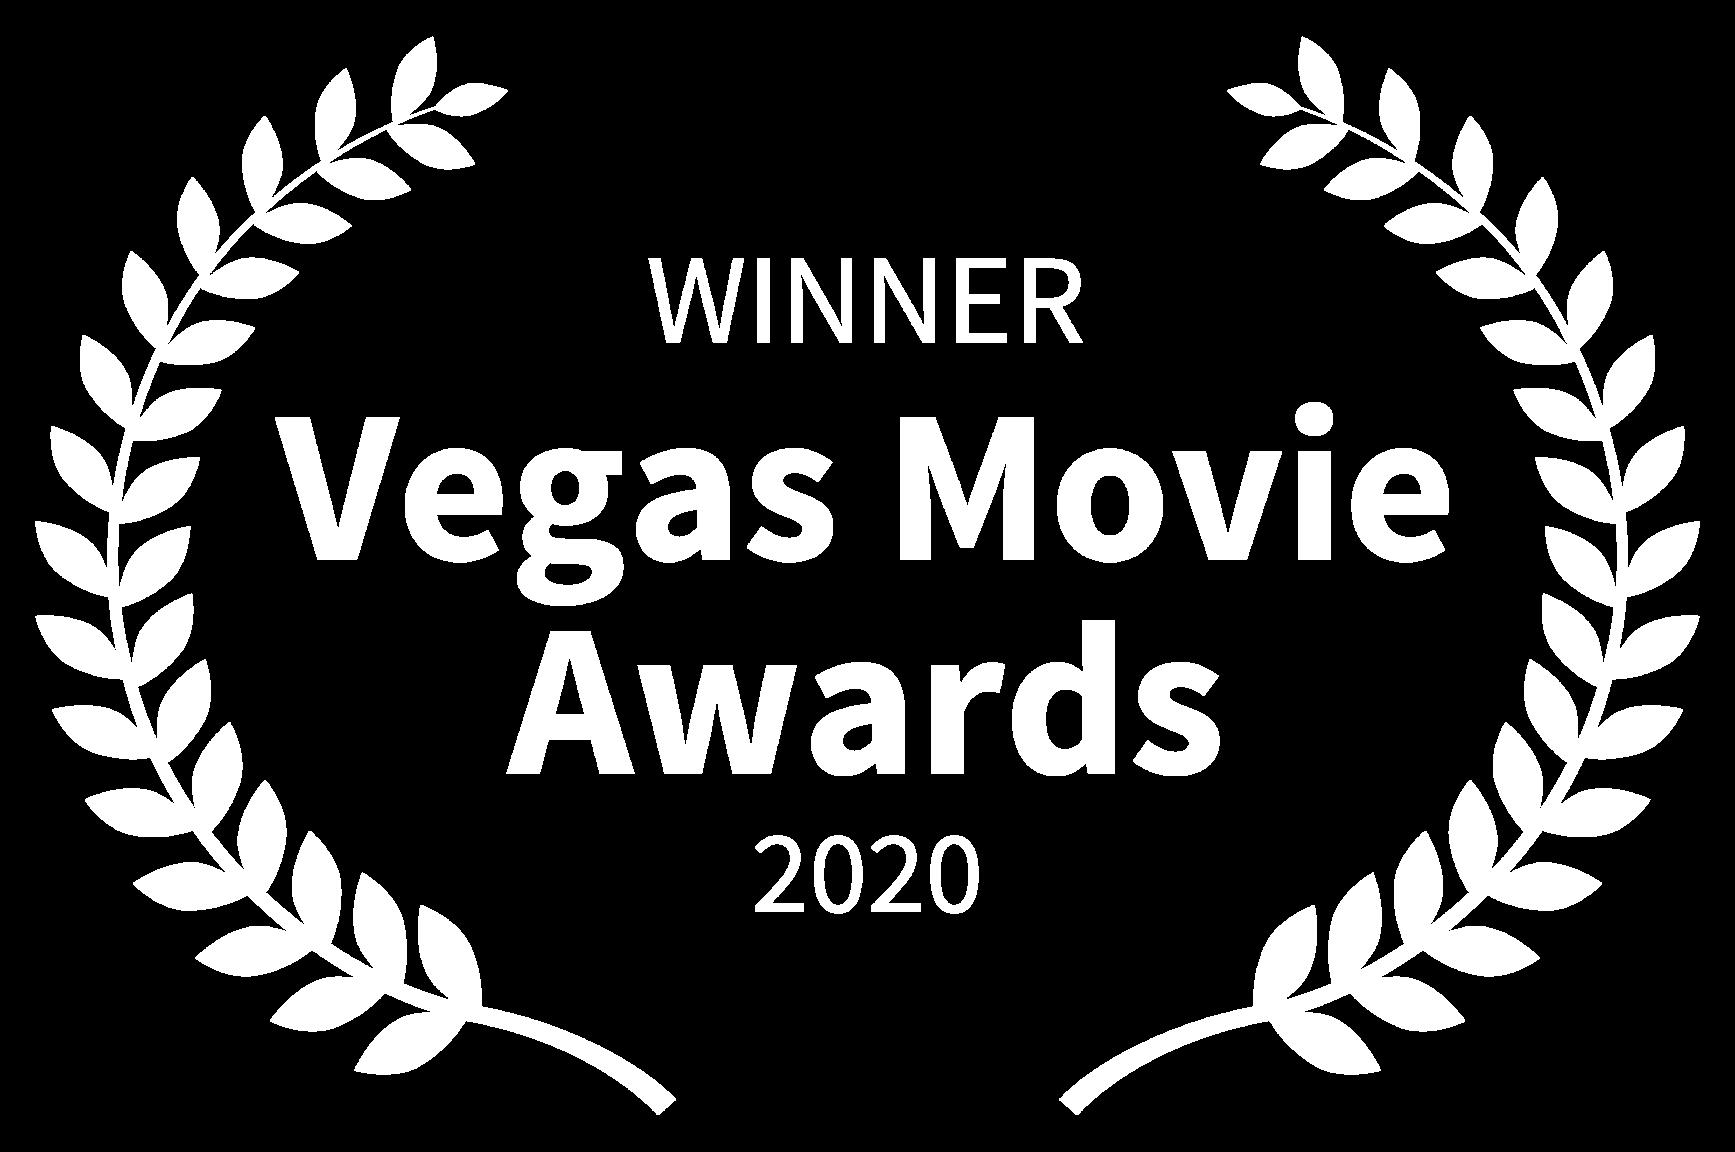 WINNER - Vegas Movie Awards - 2020